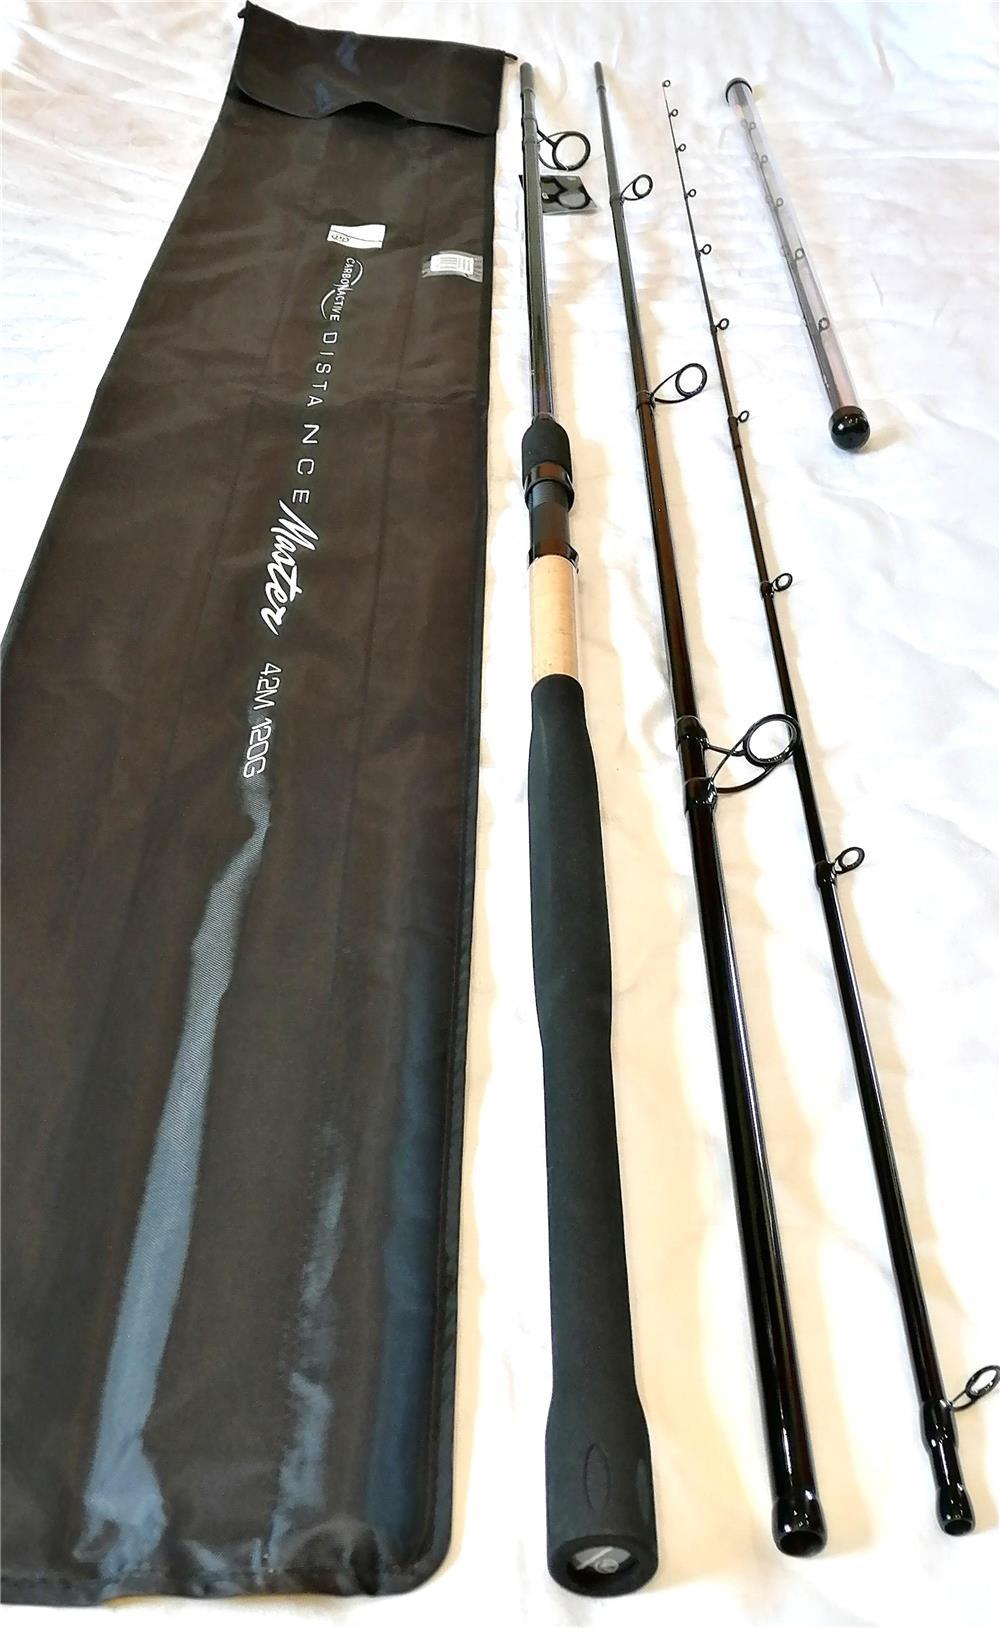 Lanseta de pescuit la feeder Preston Carbonactive Distance Master 4,2m